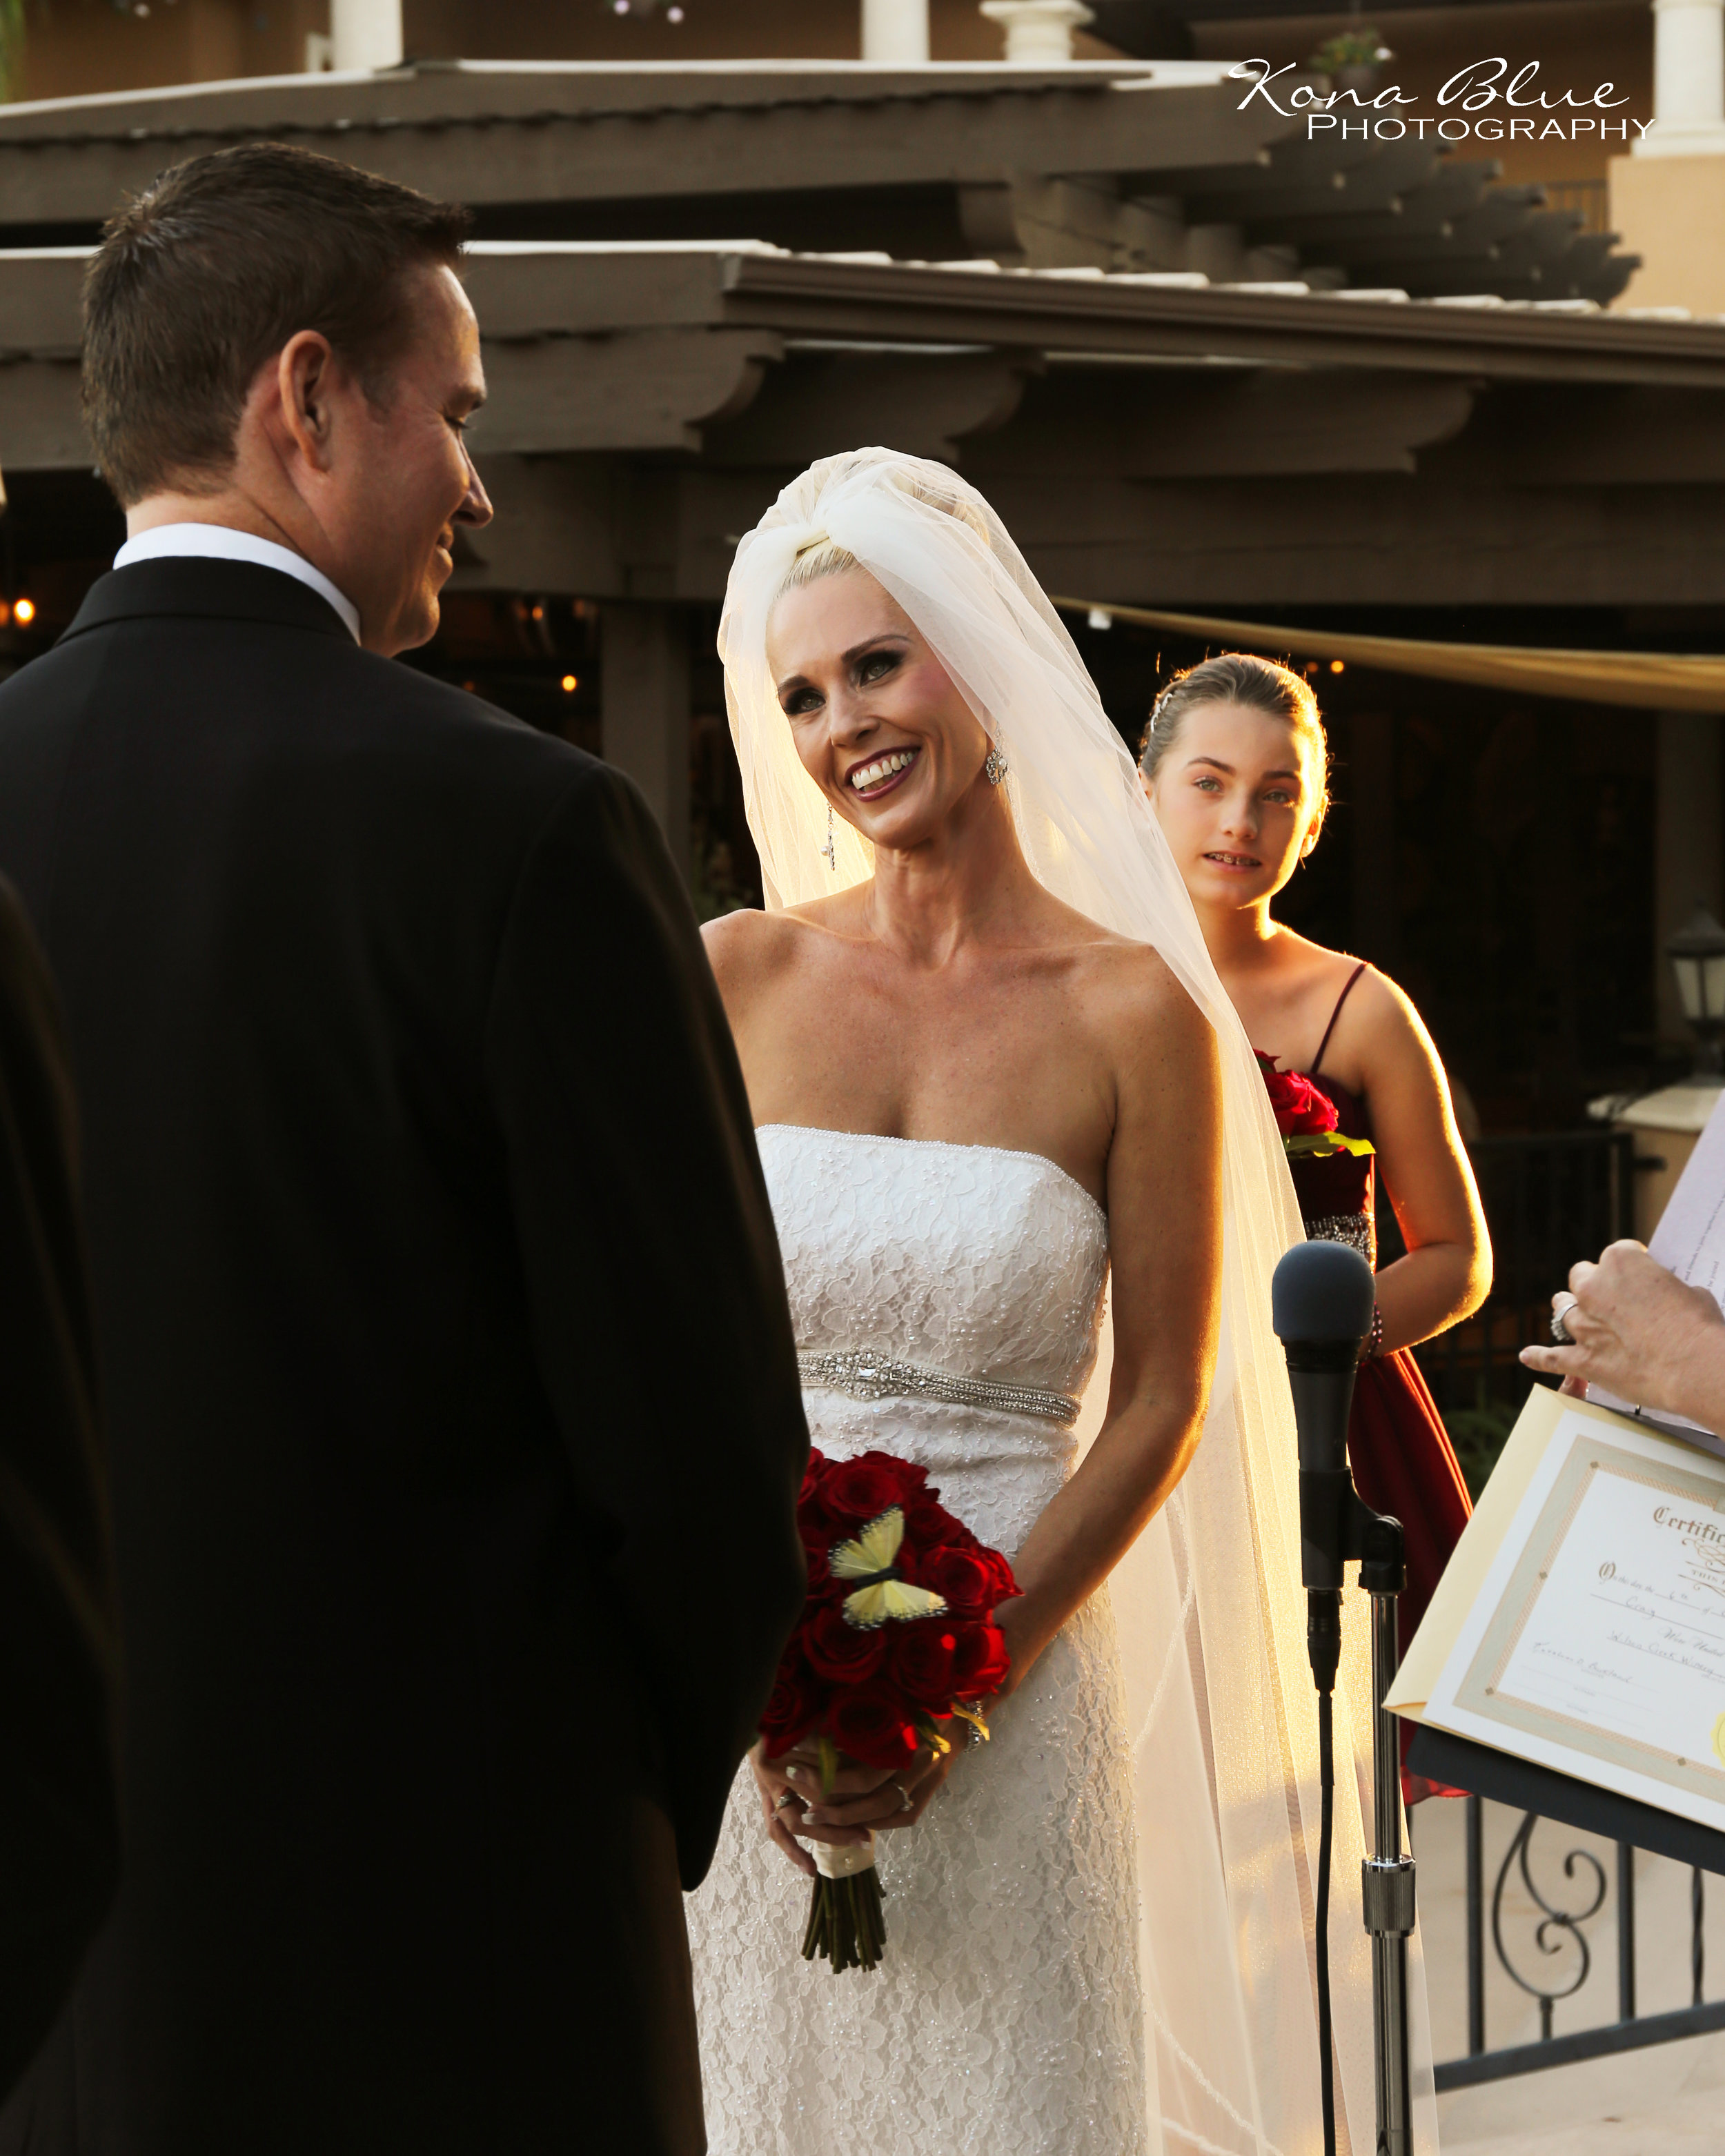 Maureen & Craigs Wedding Day (4).jpg